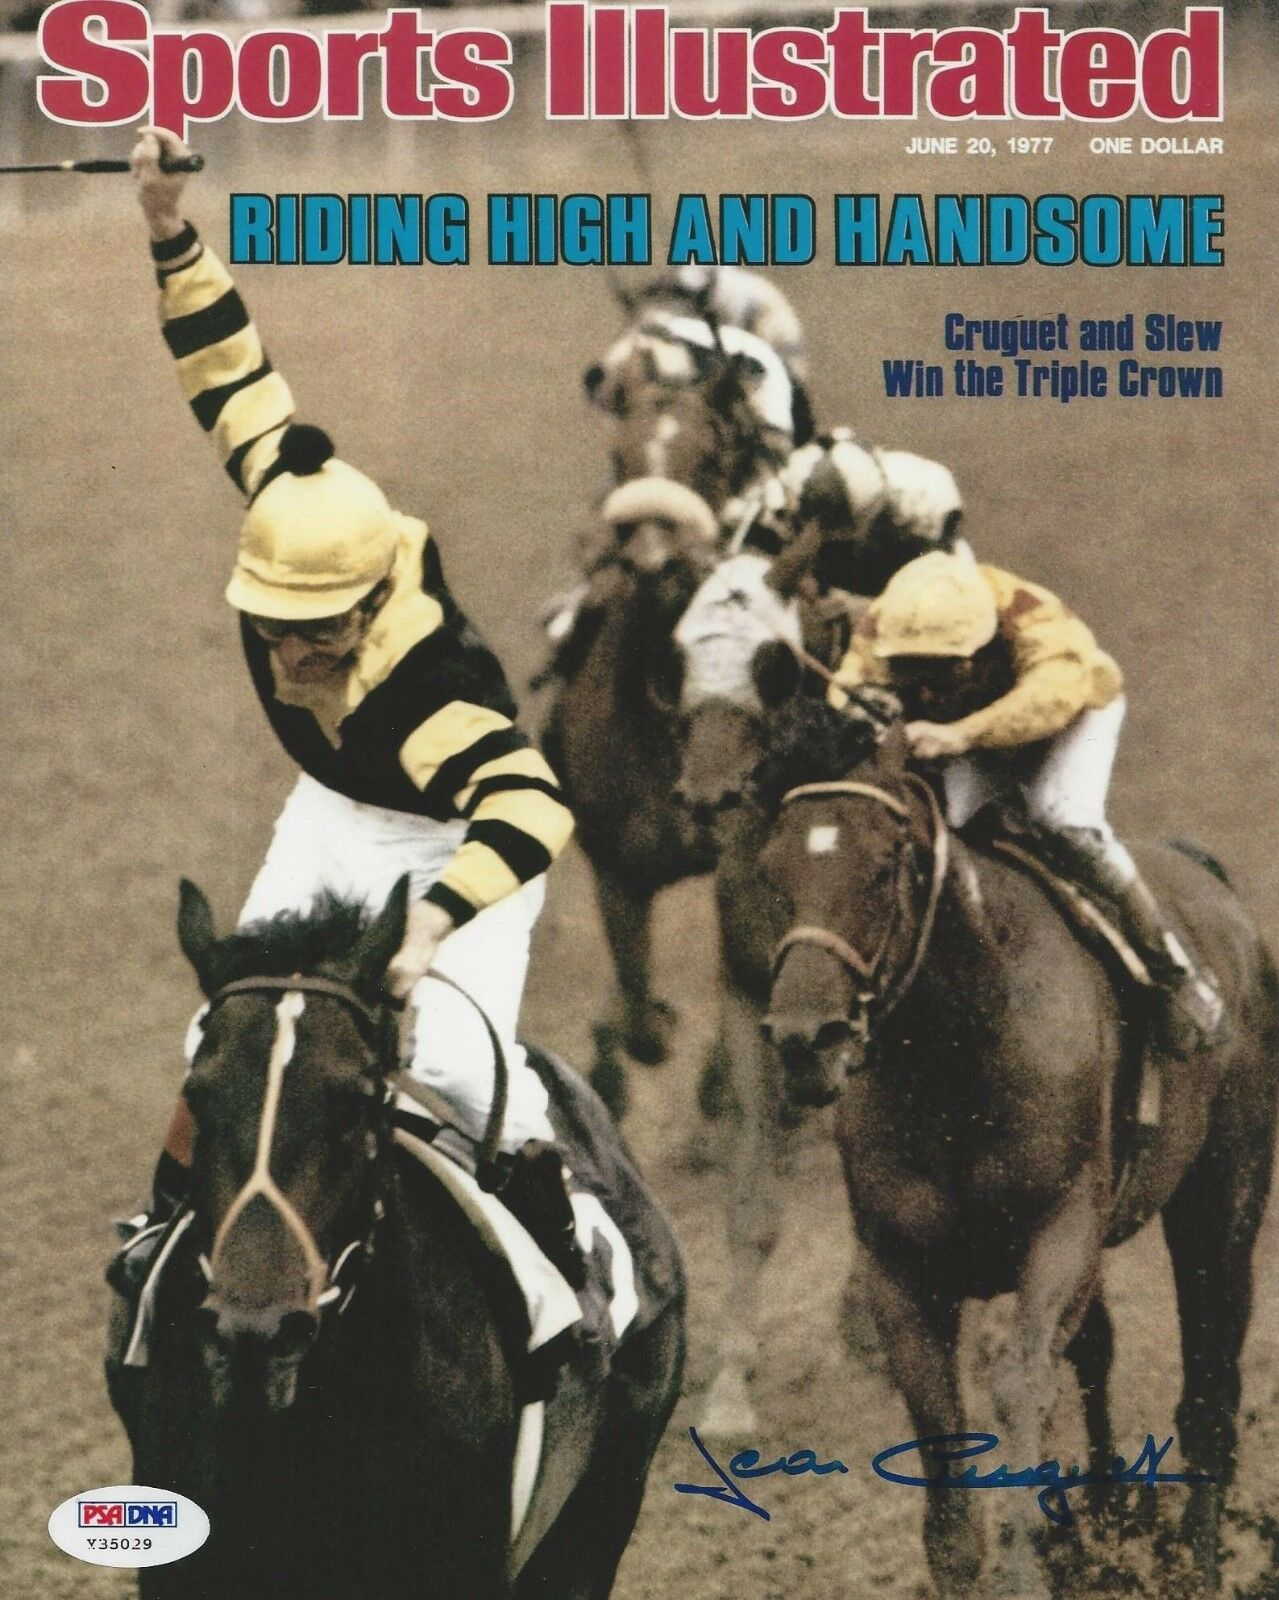 Jean Cruguet Horse Racing Jockey Signed 8x10 Photo - PSA/DNA # Y35029